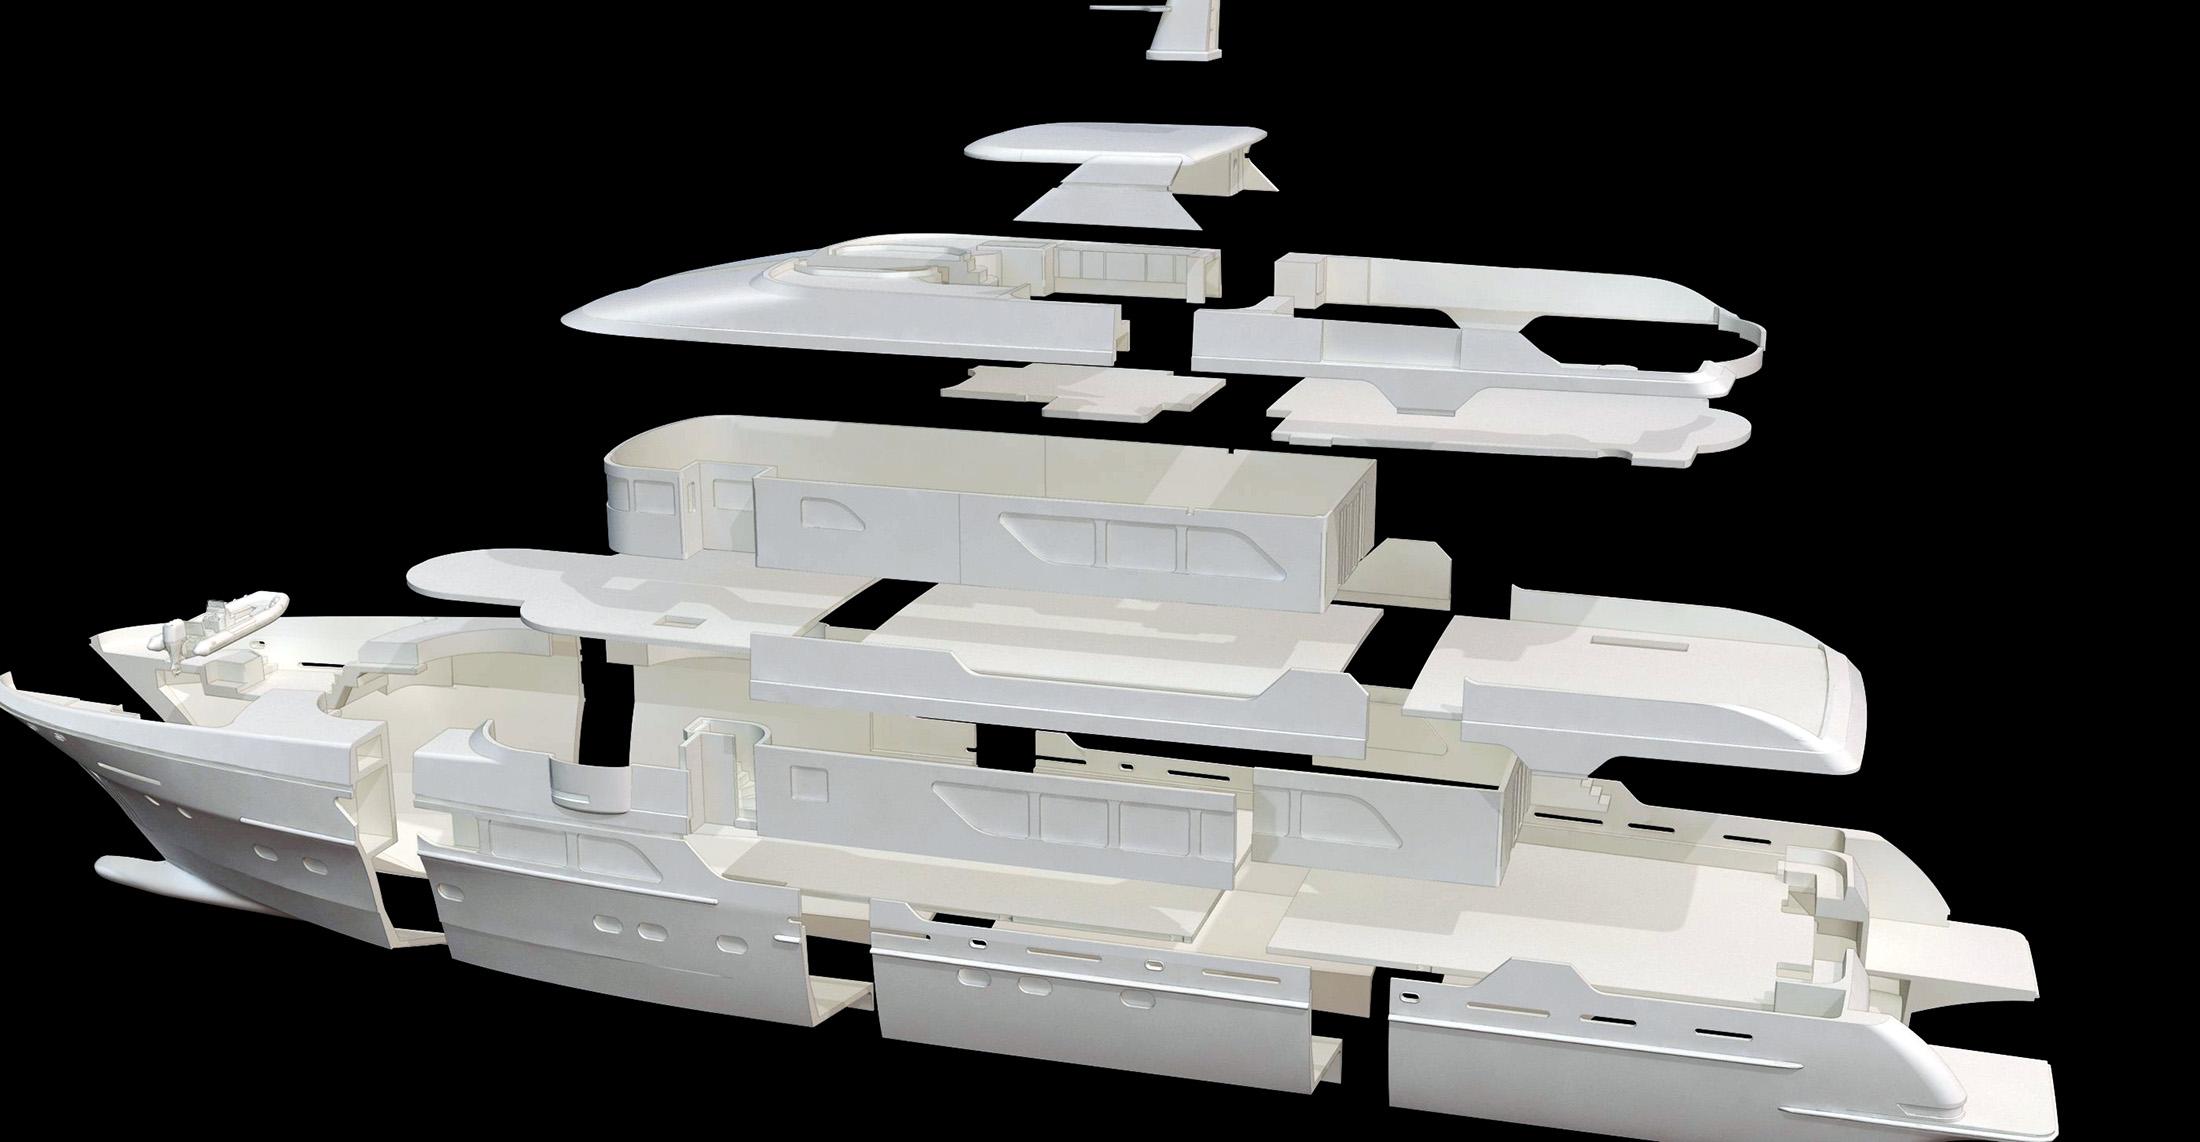 Christensen Yachts 3d Print Model